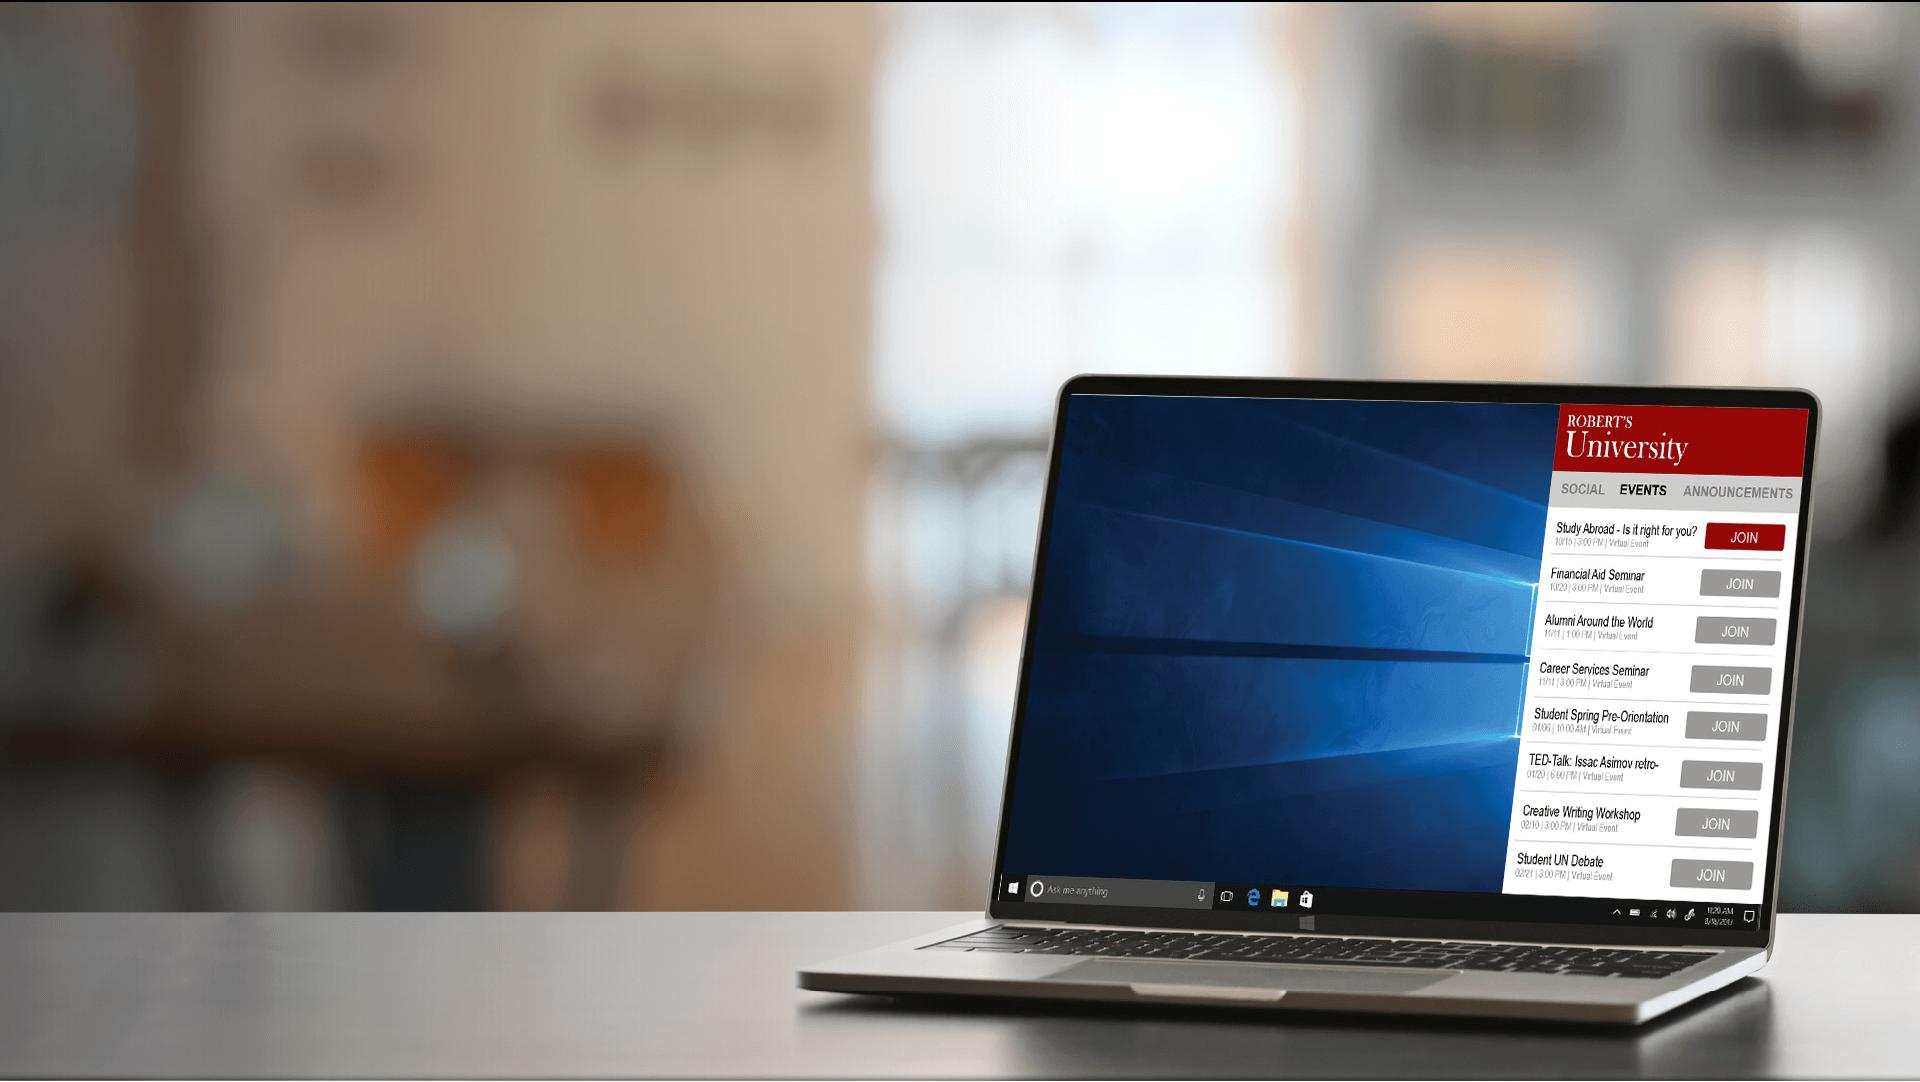 University-DBA-Laptop